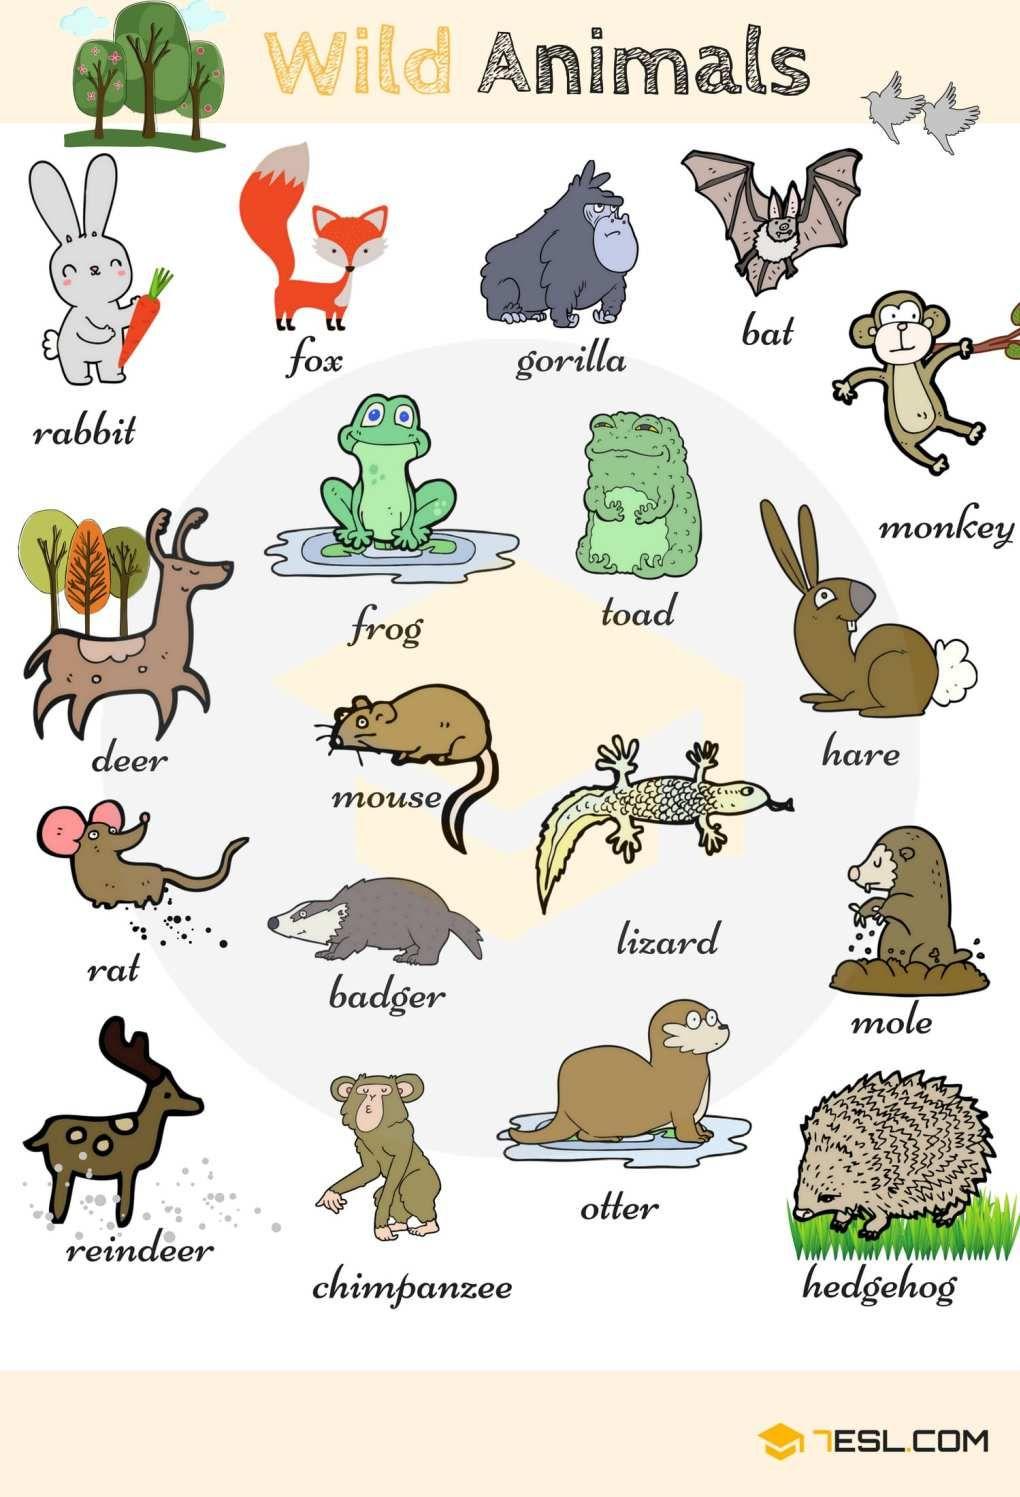 Learn Animal Names in English Animals name in english